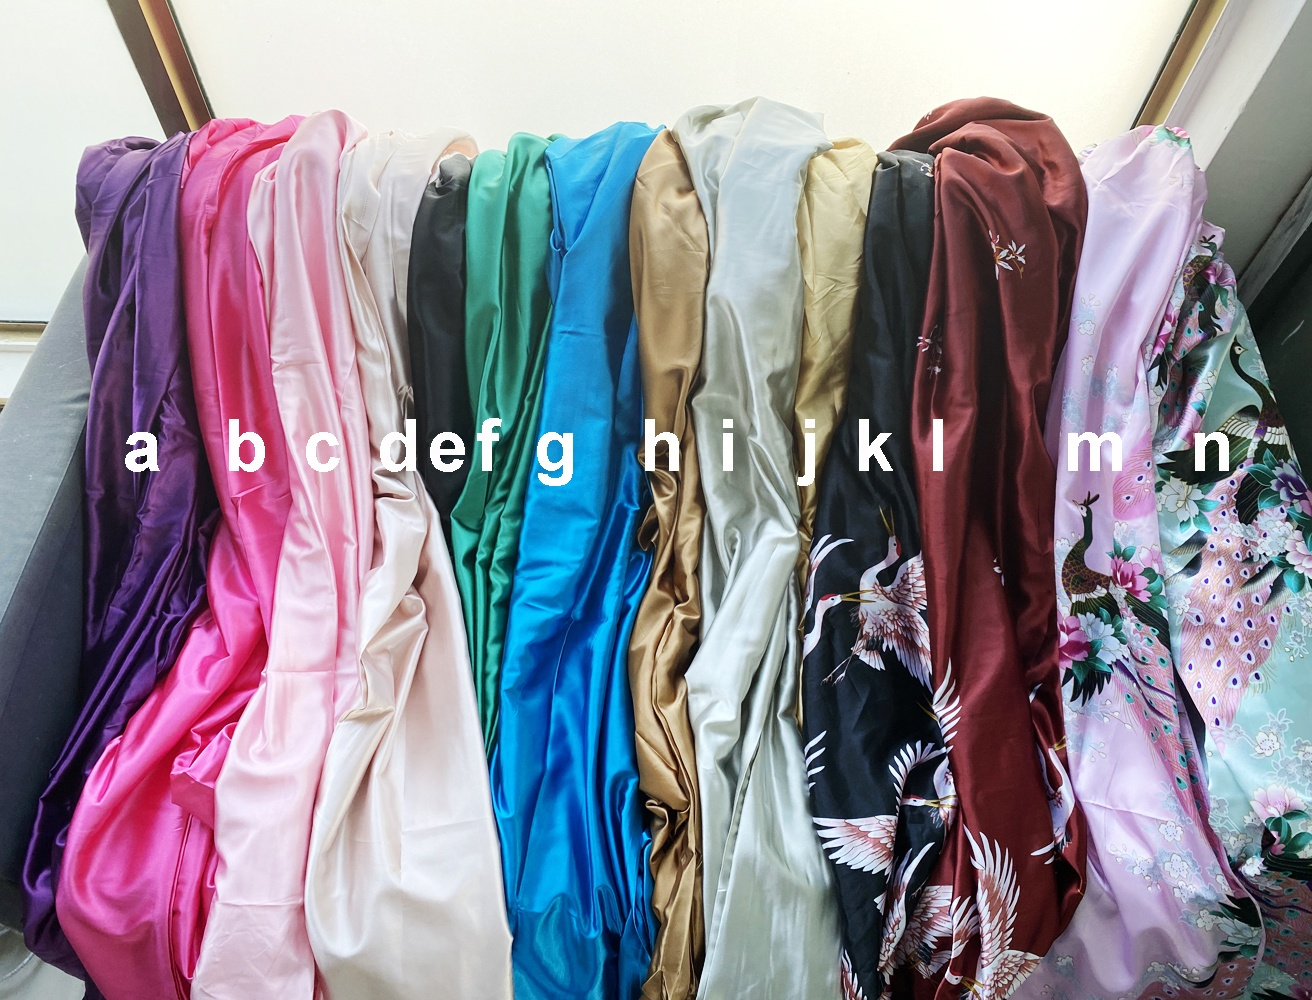 Женские халаты Yoni, паровой халат, зеленый халат, атласный шелковый халат, роскошный халат